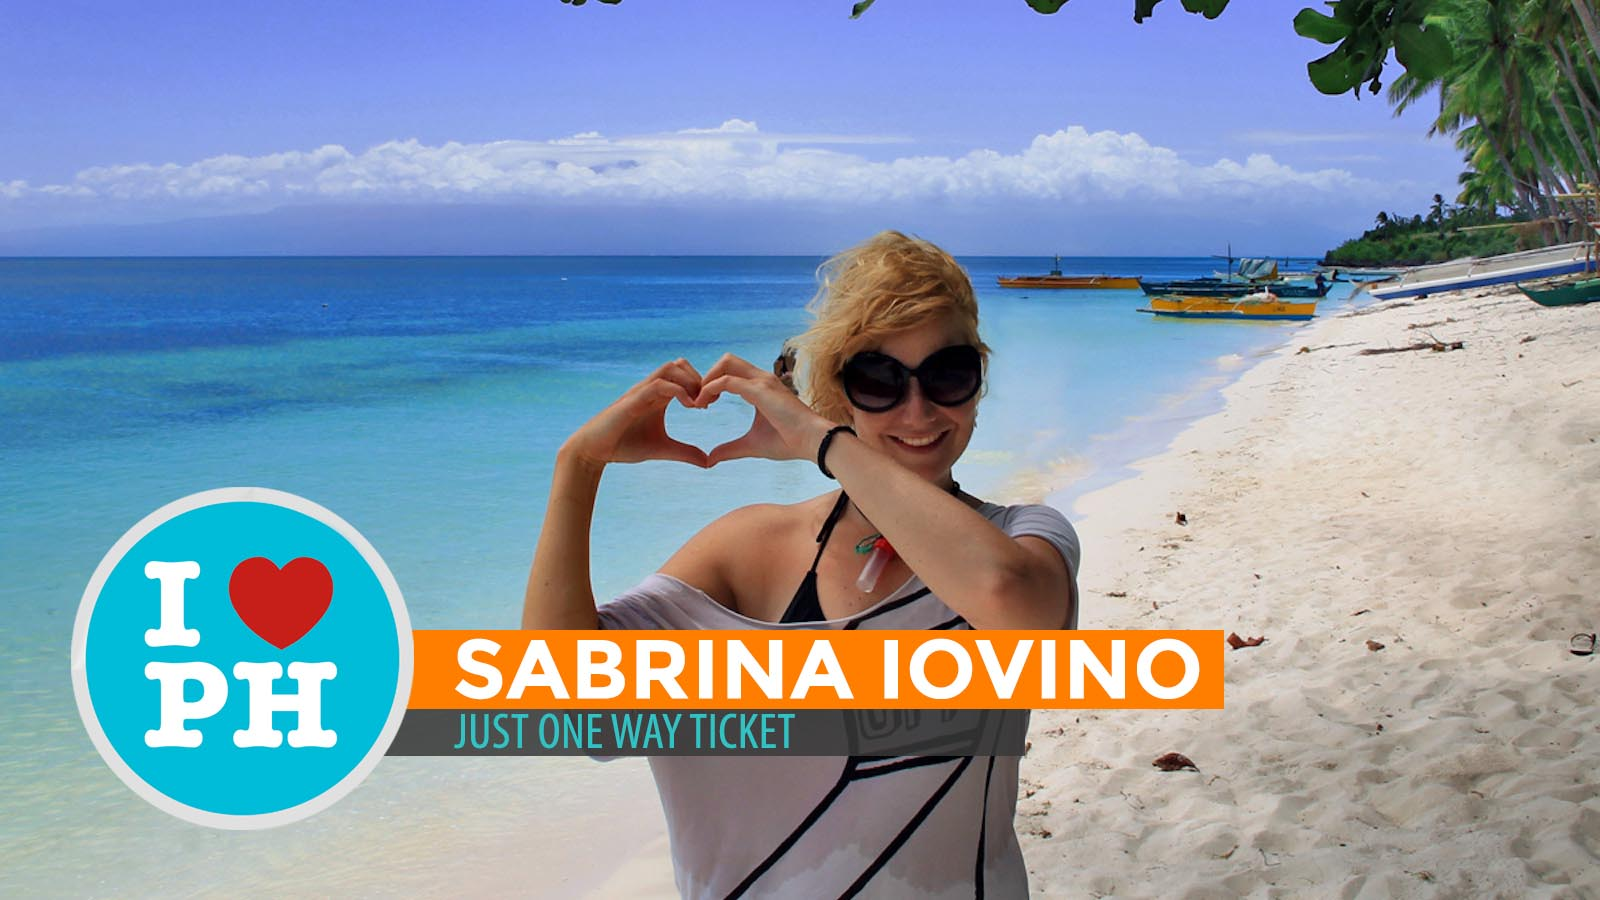 Sabrina Lovino – Just One Way Ticket